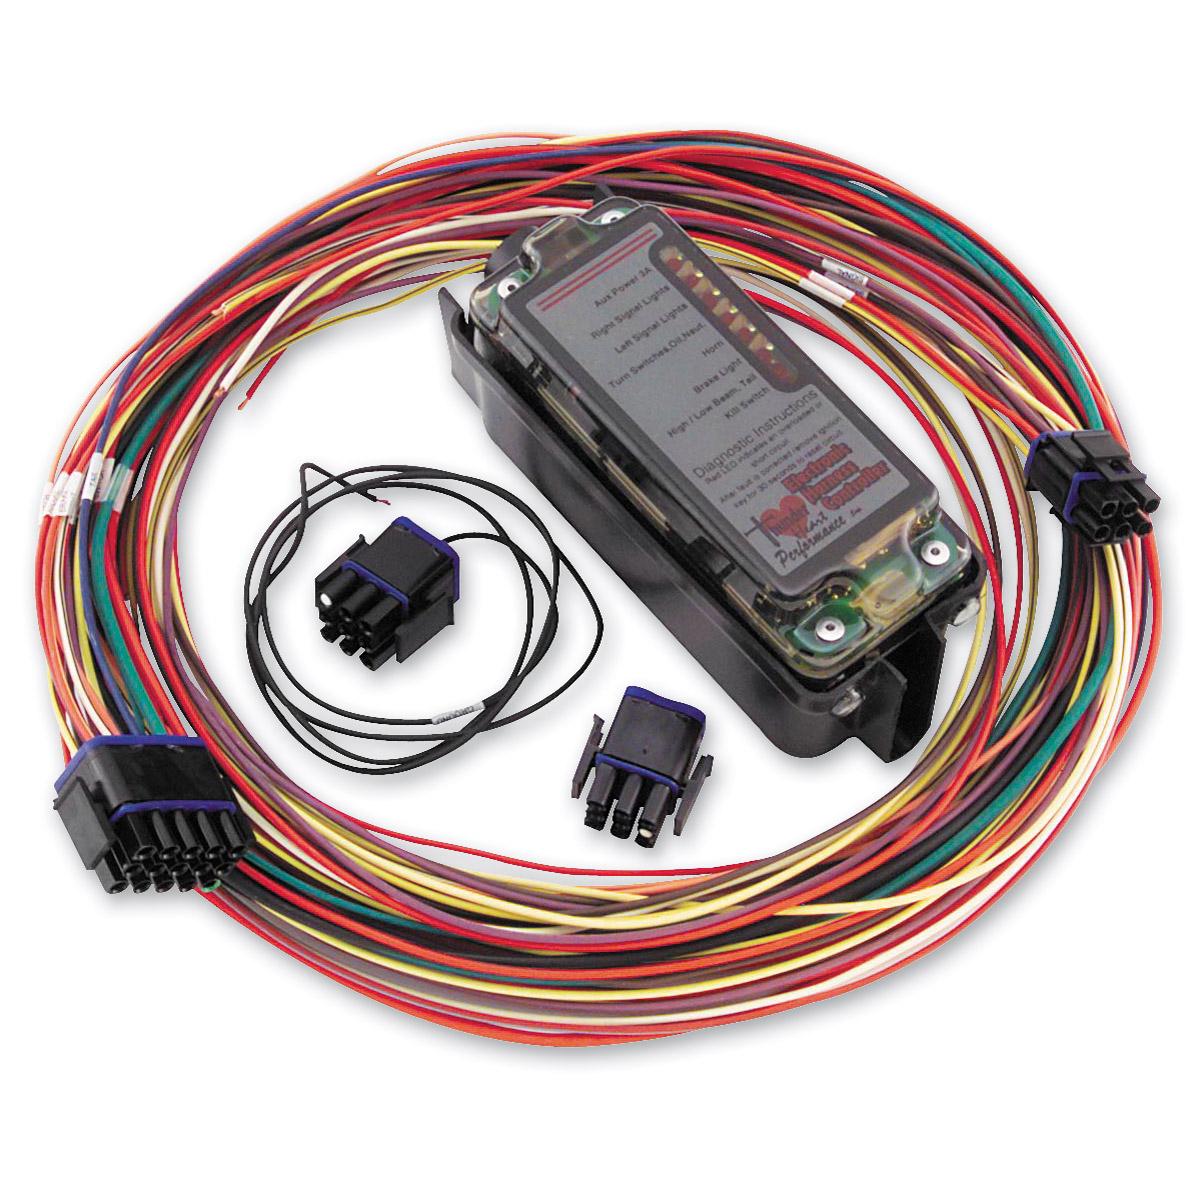 Miraculous Gm Performance Wiring Harness Basic Electronics Wiring Diagram Wiring Cloud Hisonepsysticxongrecoveryedborg